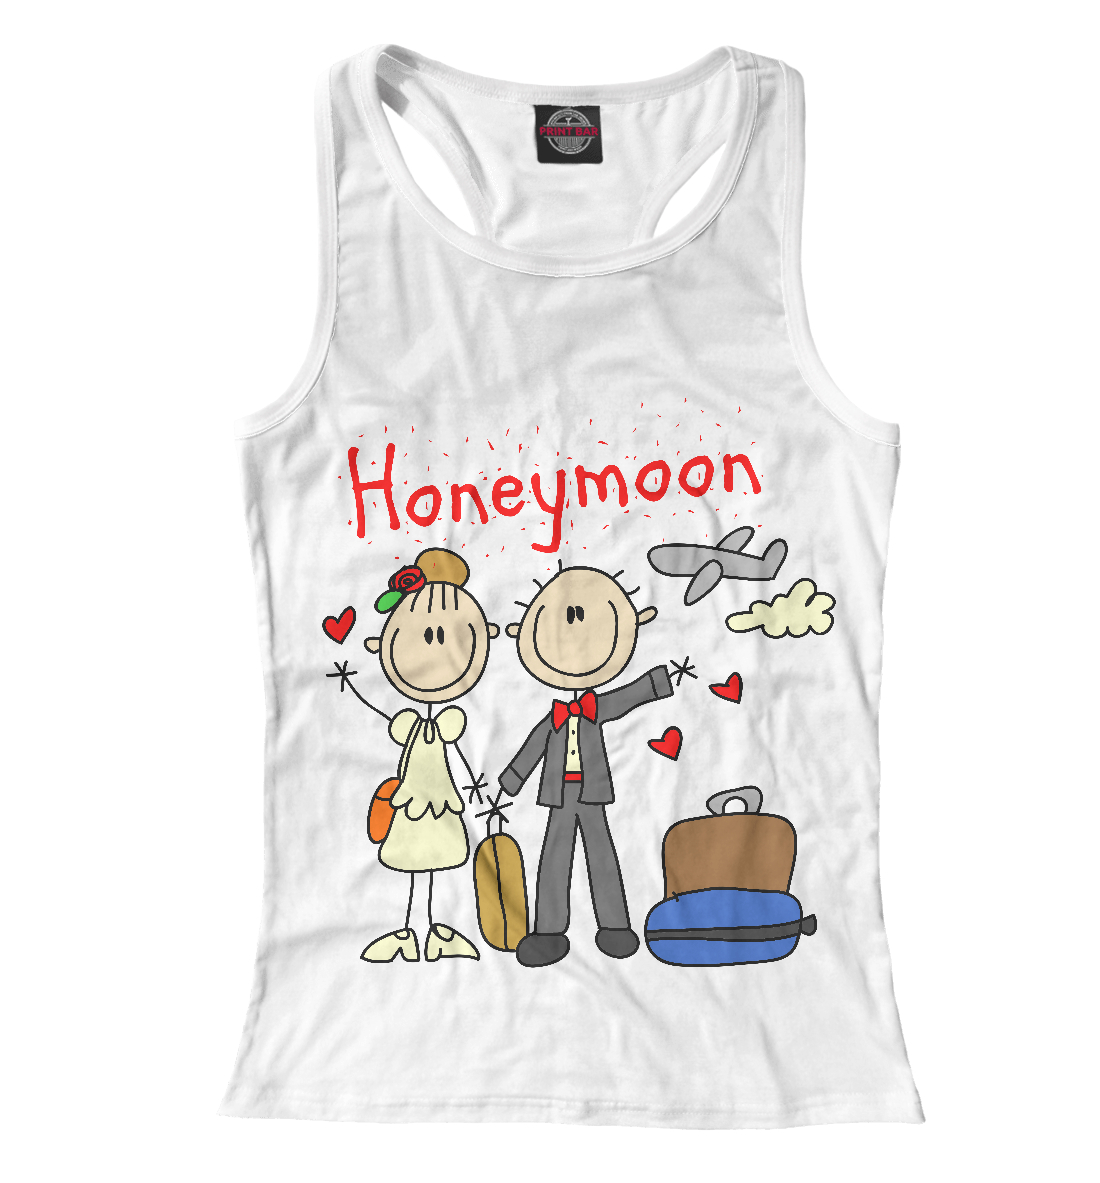 Купить Медовый месяц, Printbar, Майки борцовки, APD-744509-mayb-1